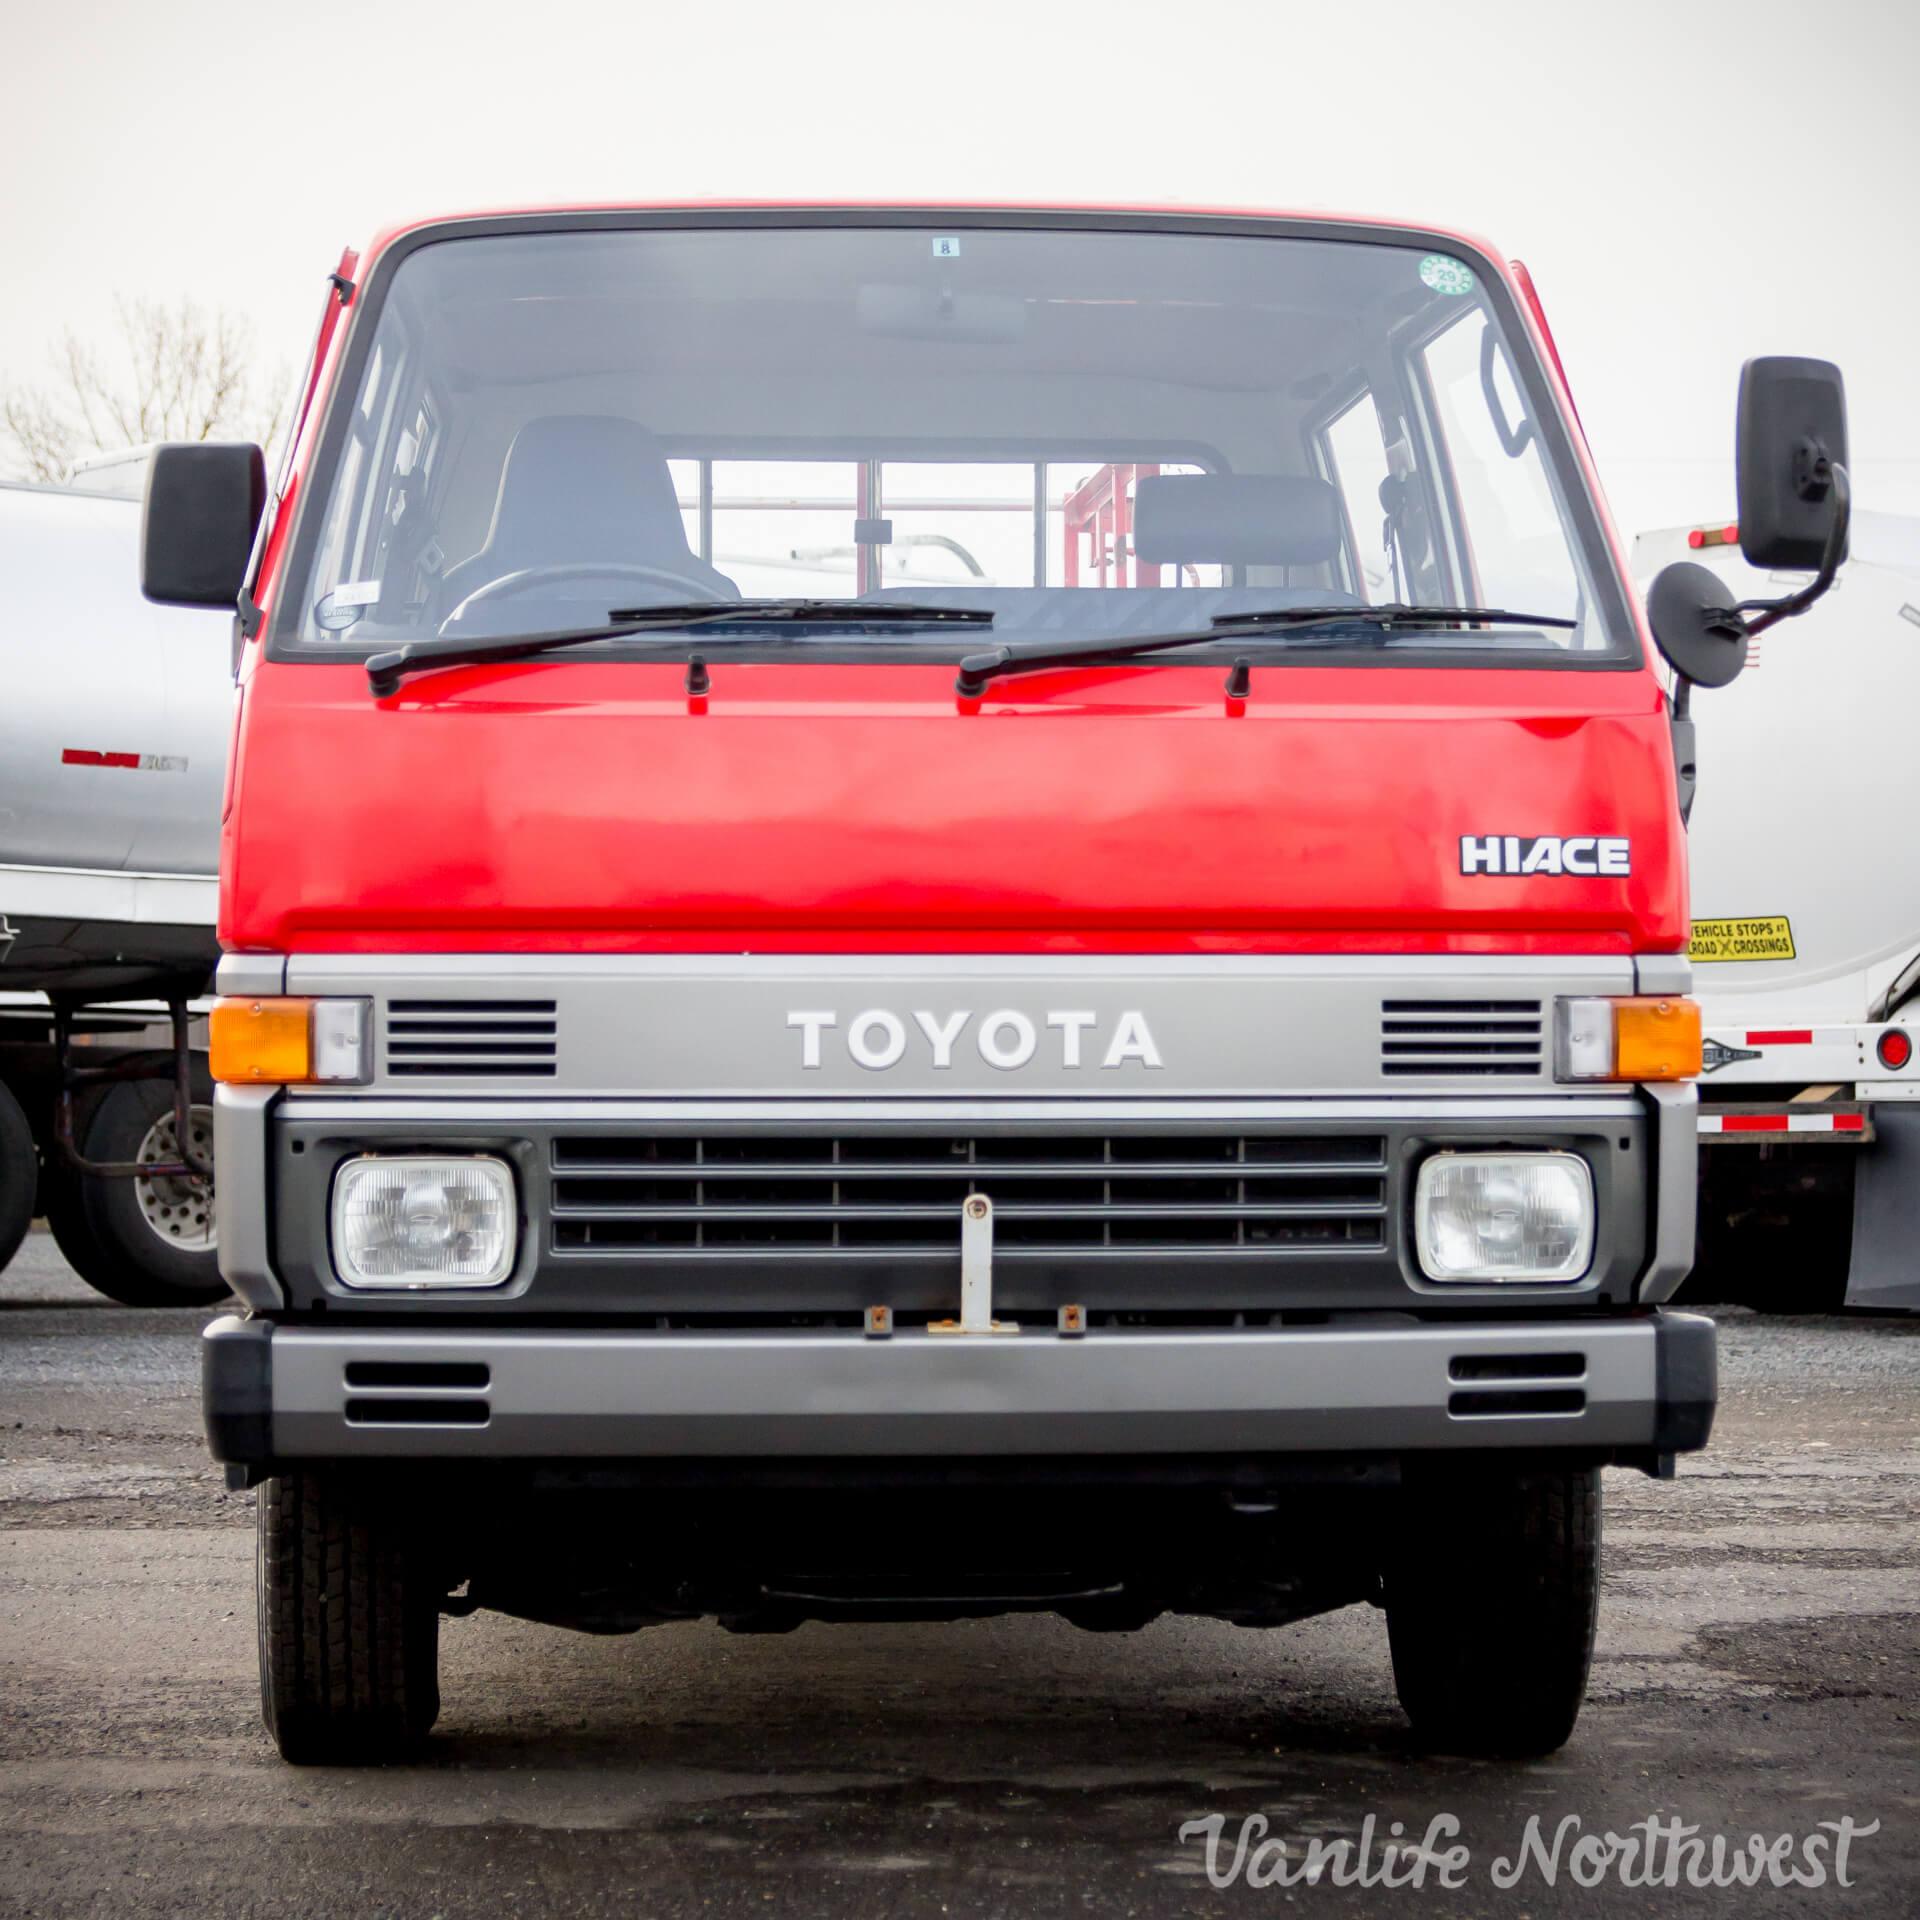 ToyotaHiaceFireTruckLH851990-7.jpg